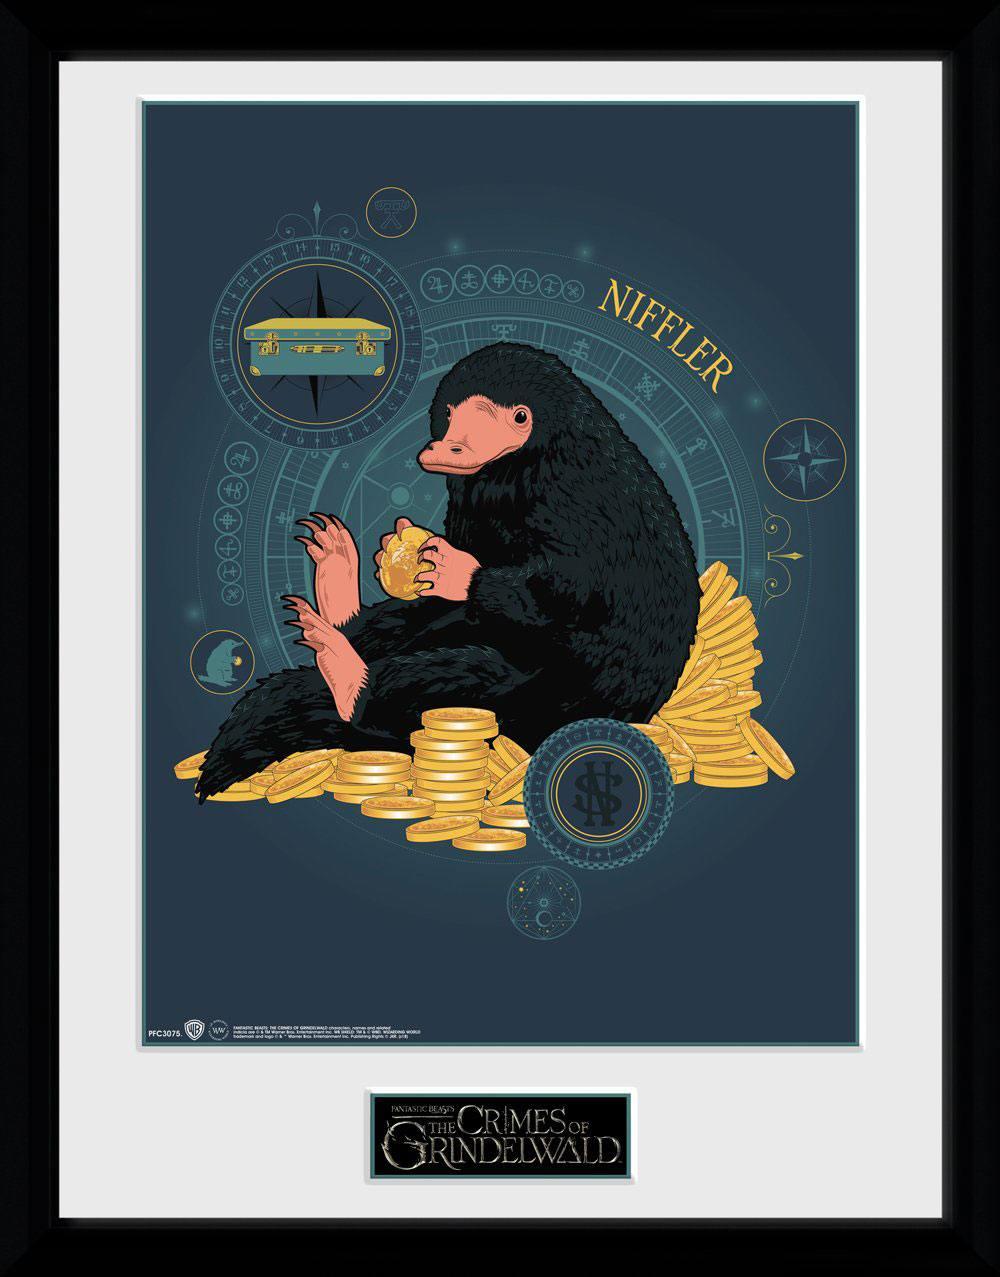 Fantastic Beasts 2 Framed Poster Niffler Coin 45 x 34 cm